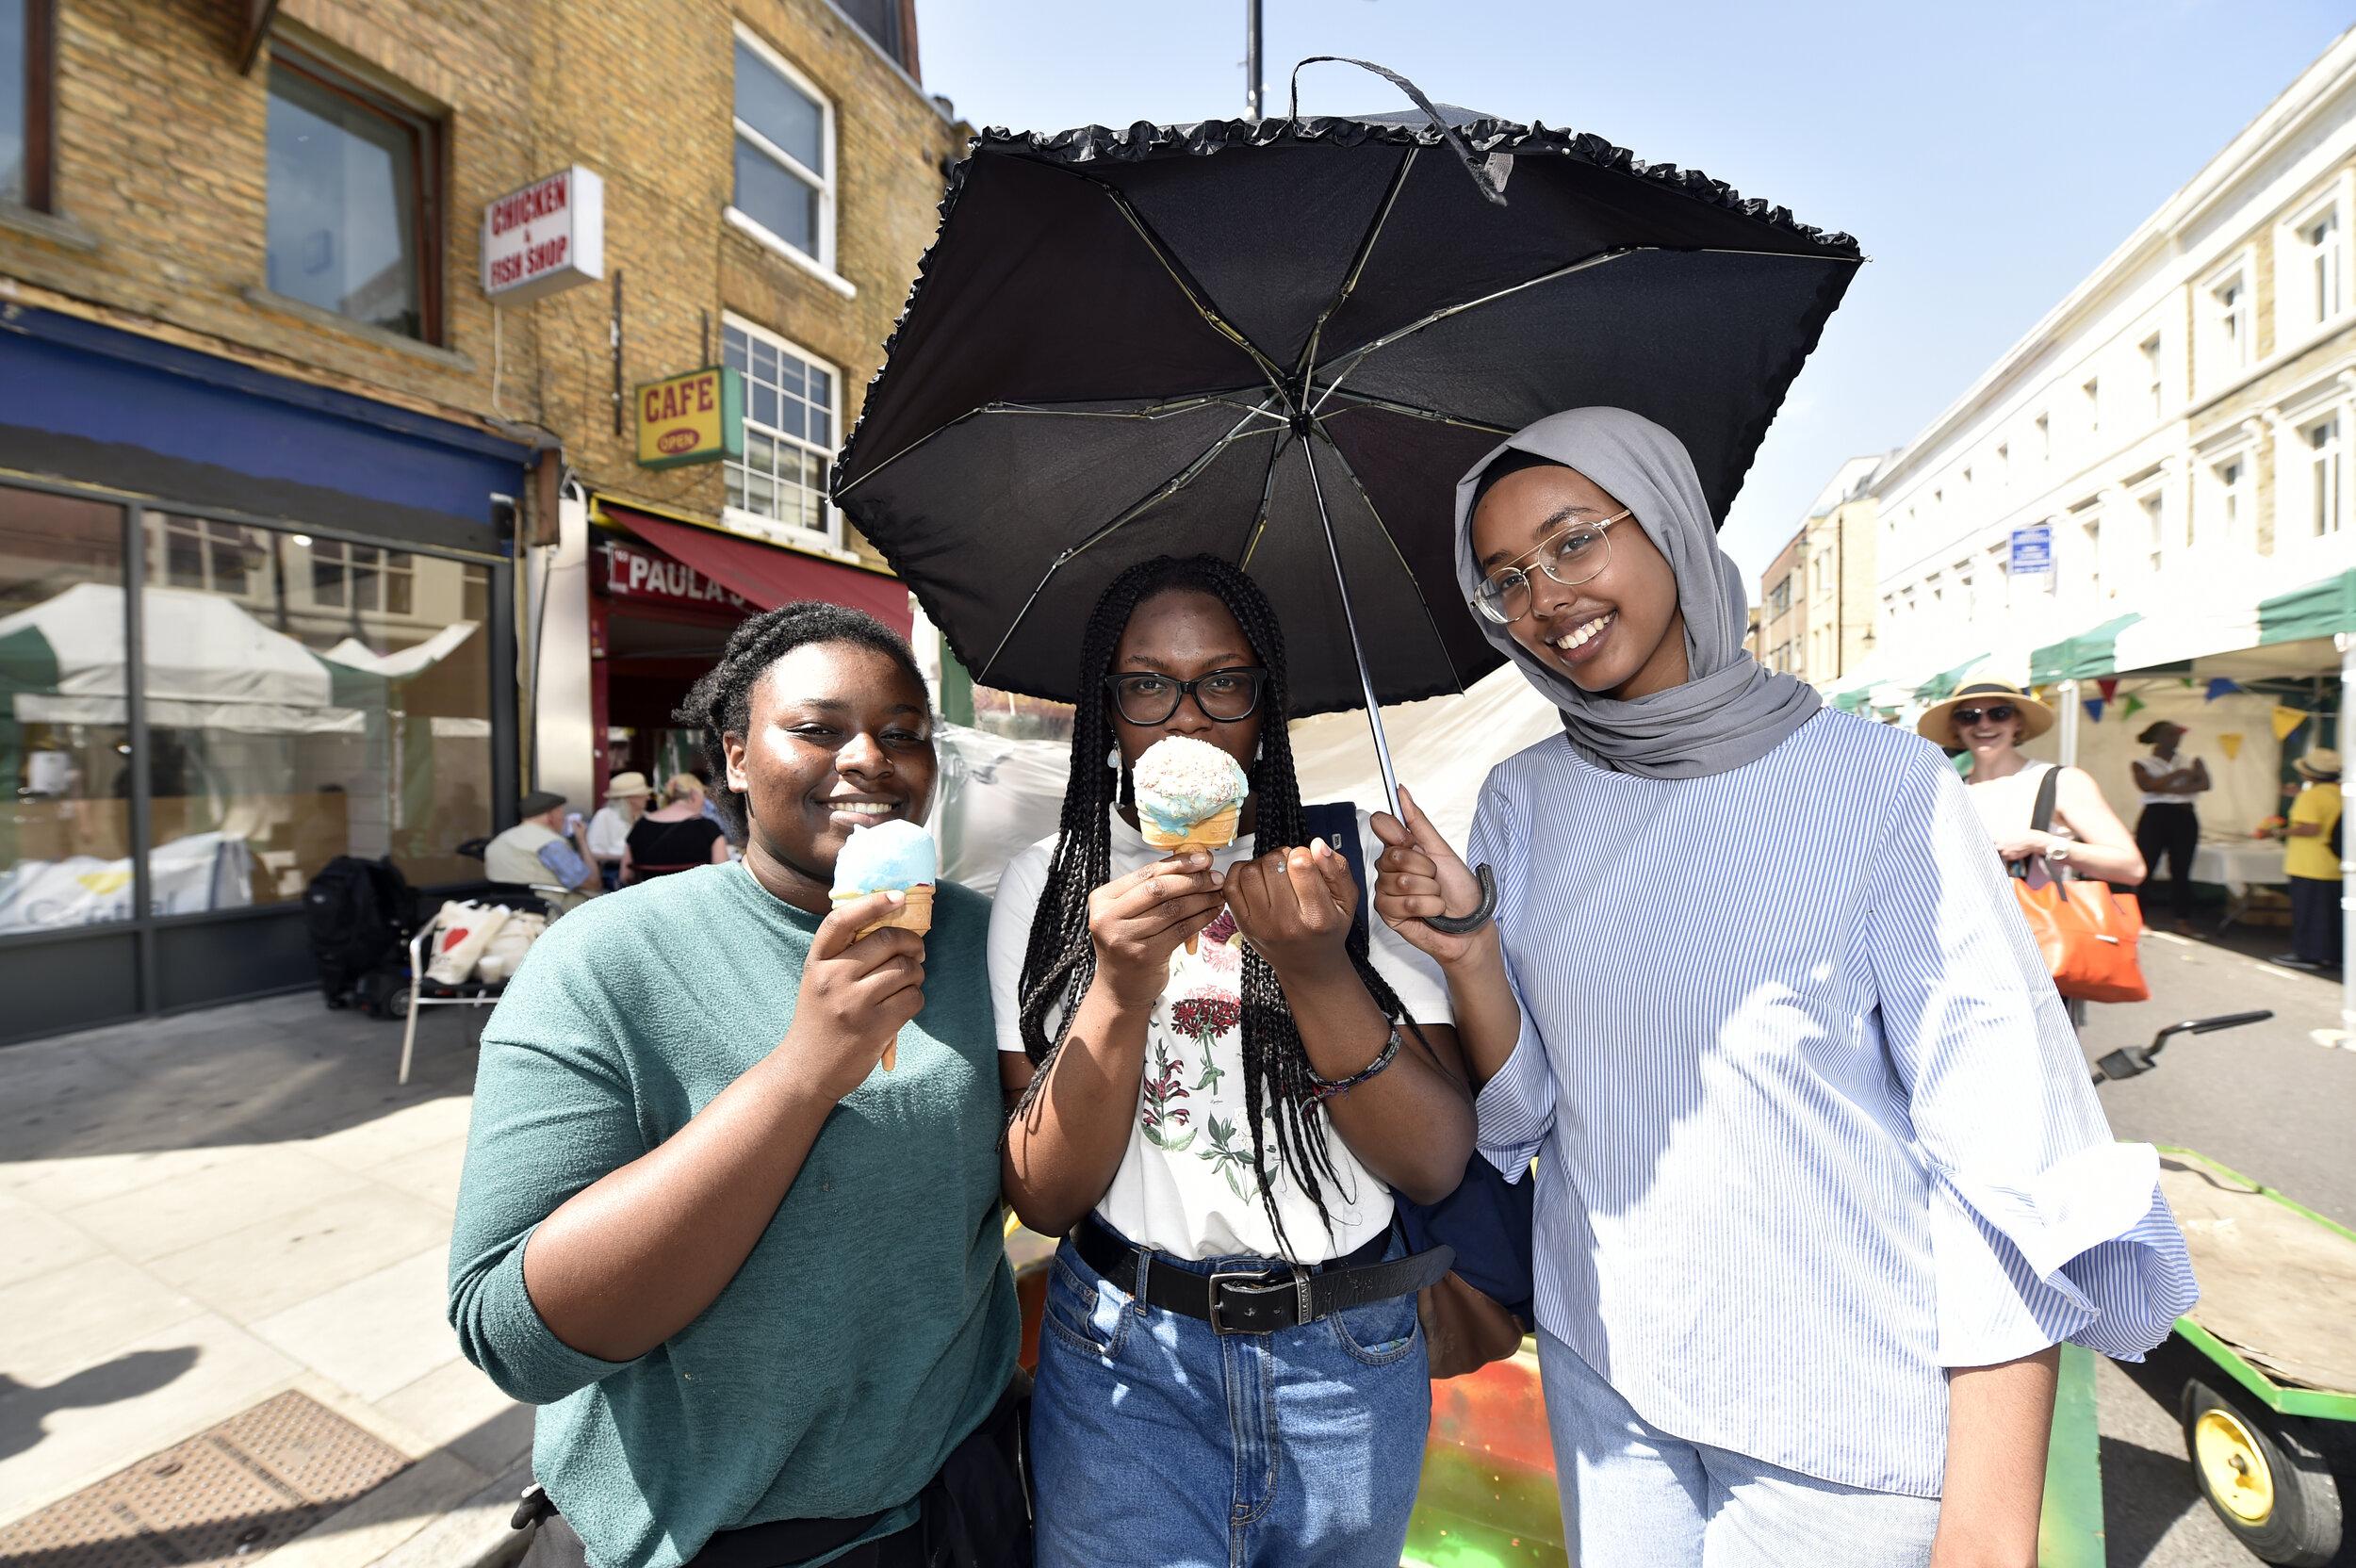 Hoxton St Summer Fair 2019